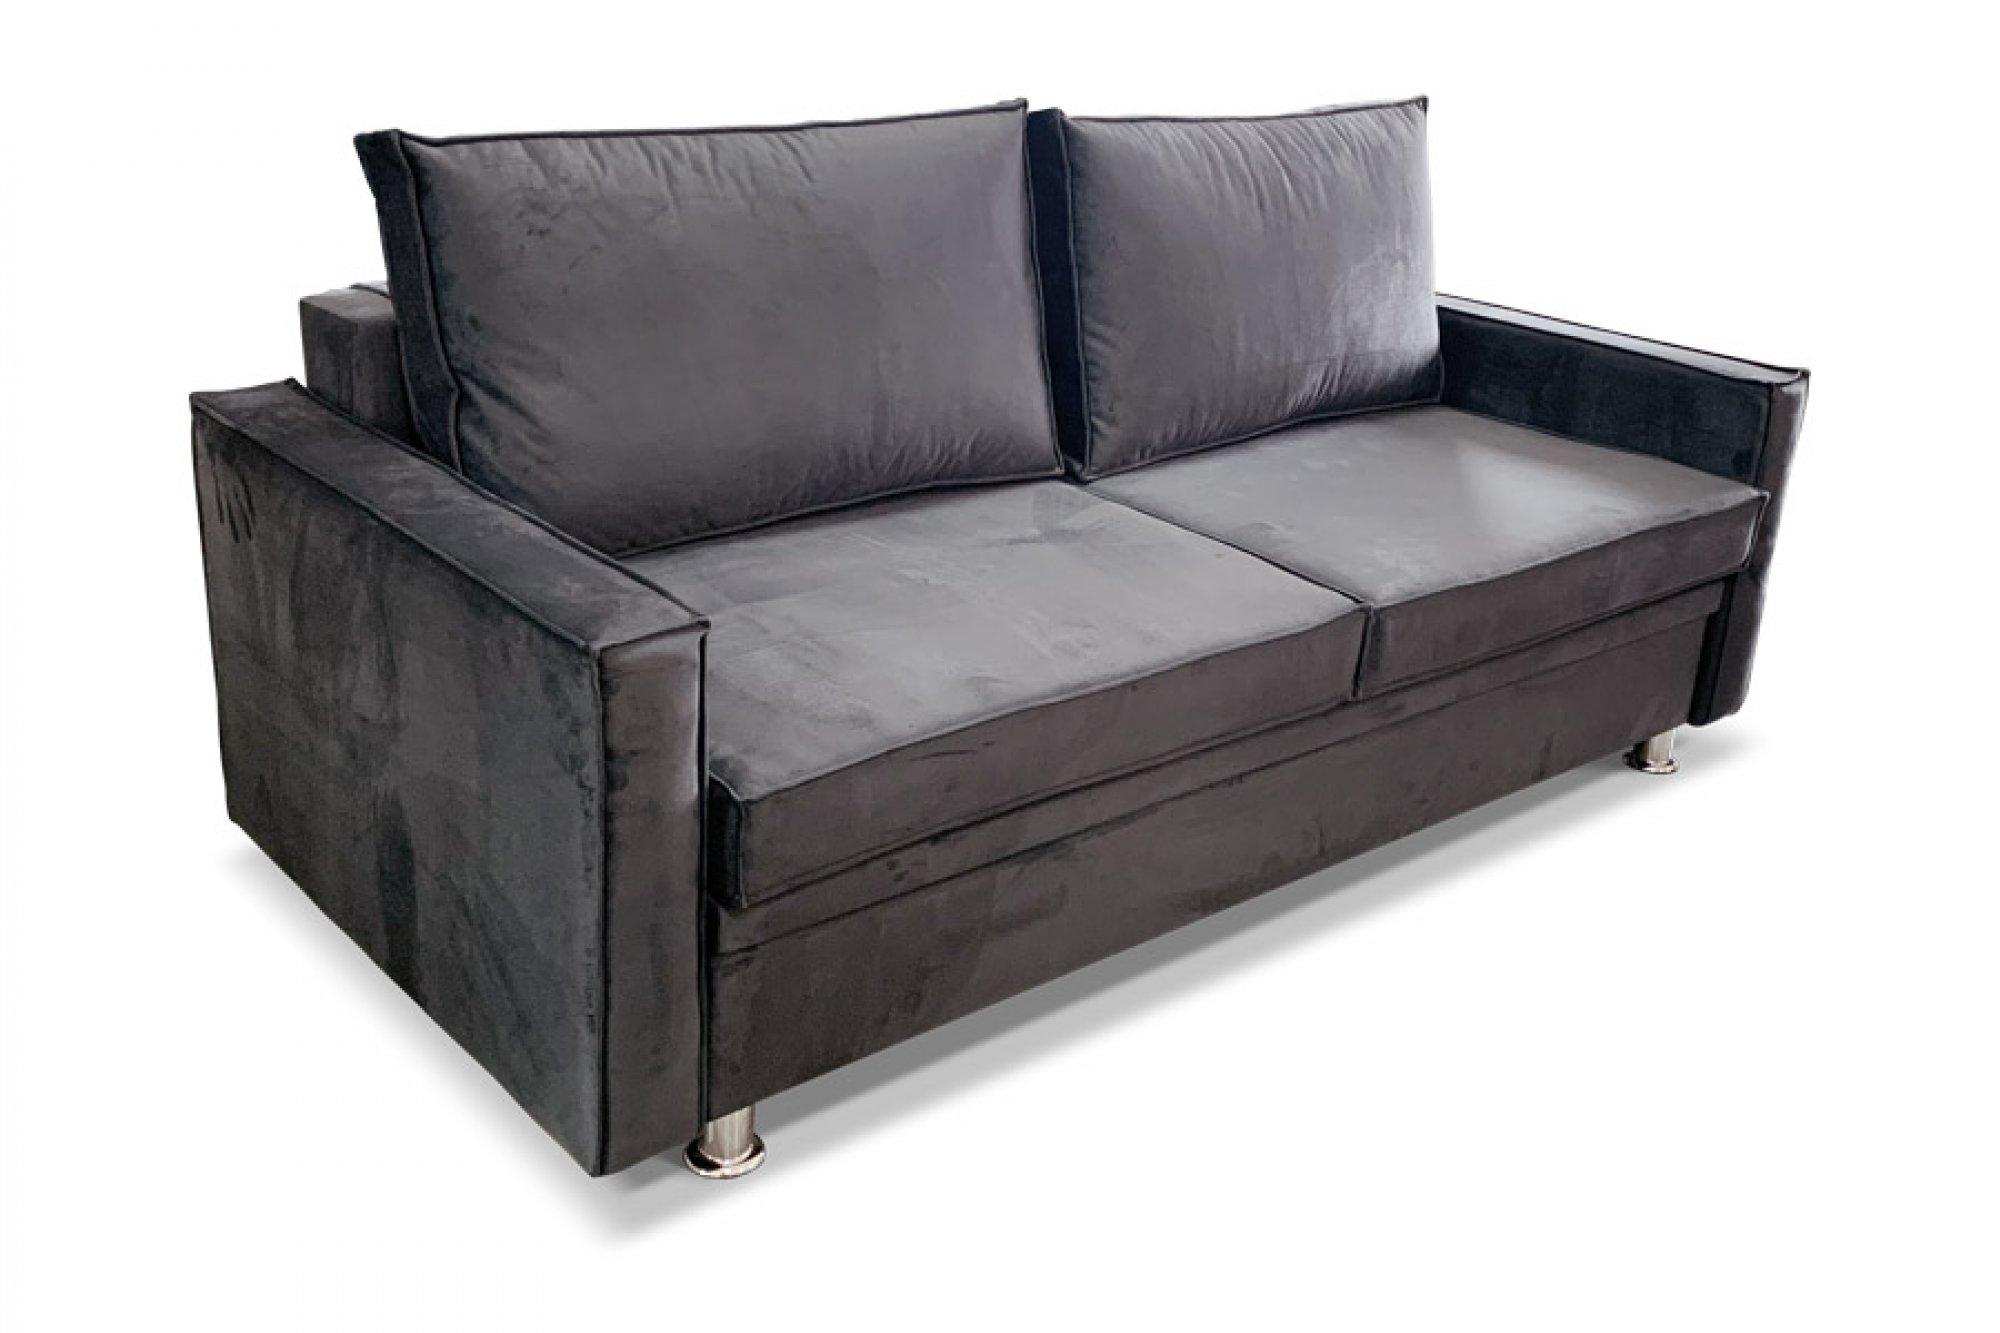 sofa_palermo-1